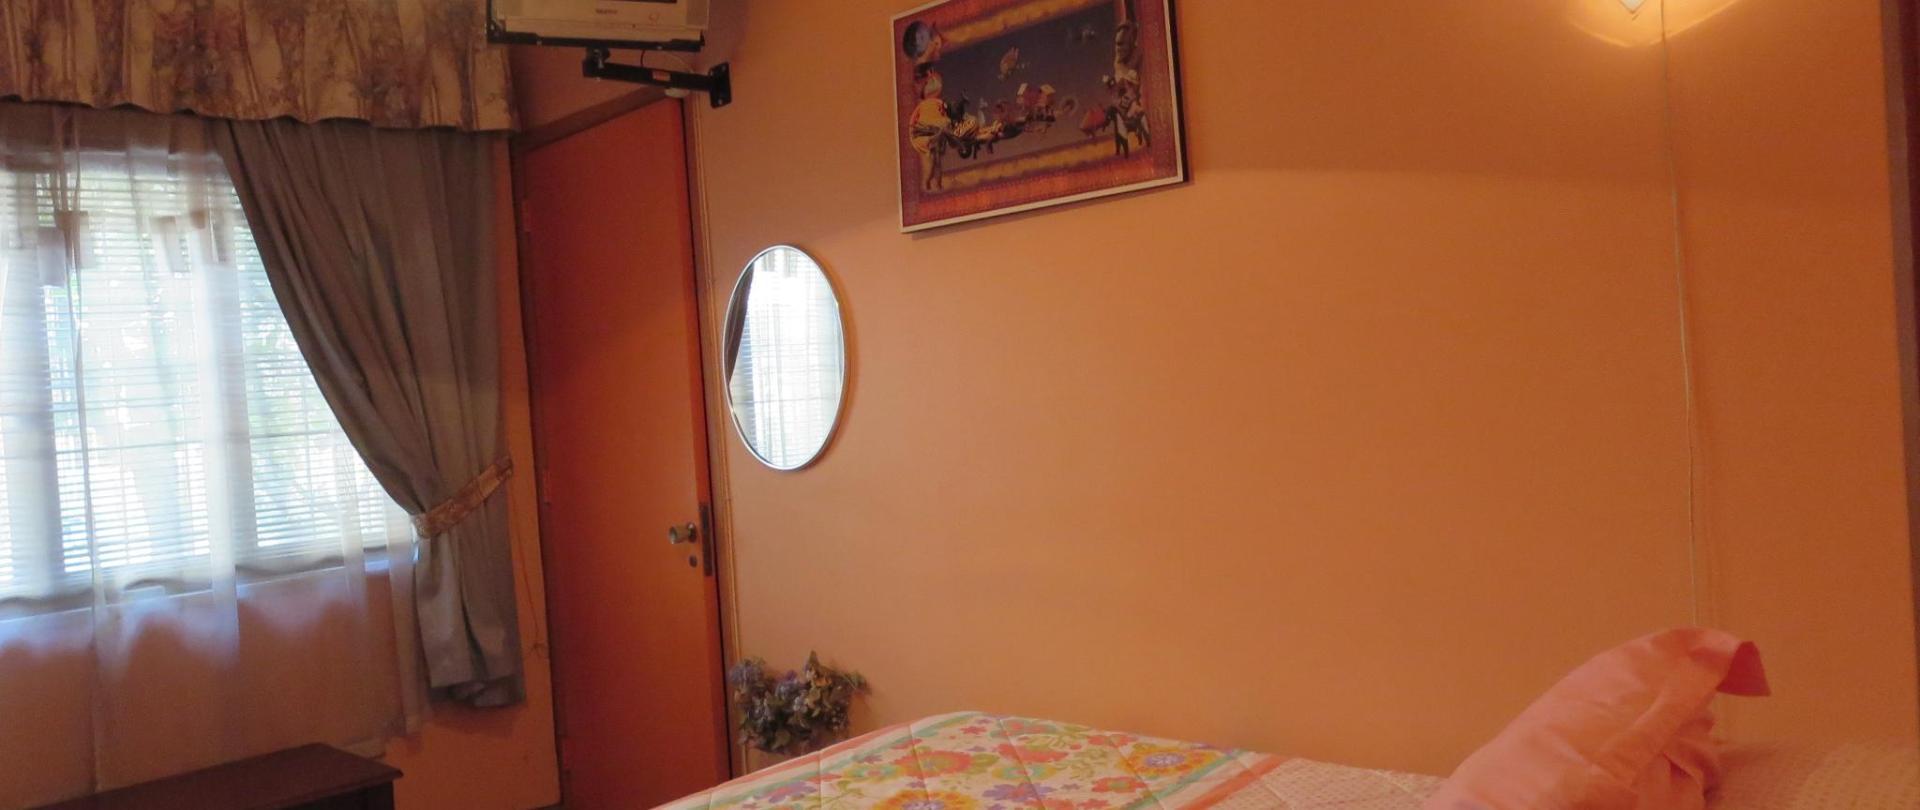 A1 Room Sgl.JPG